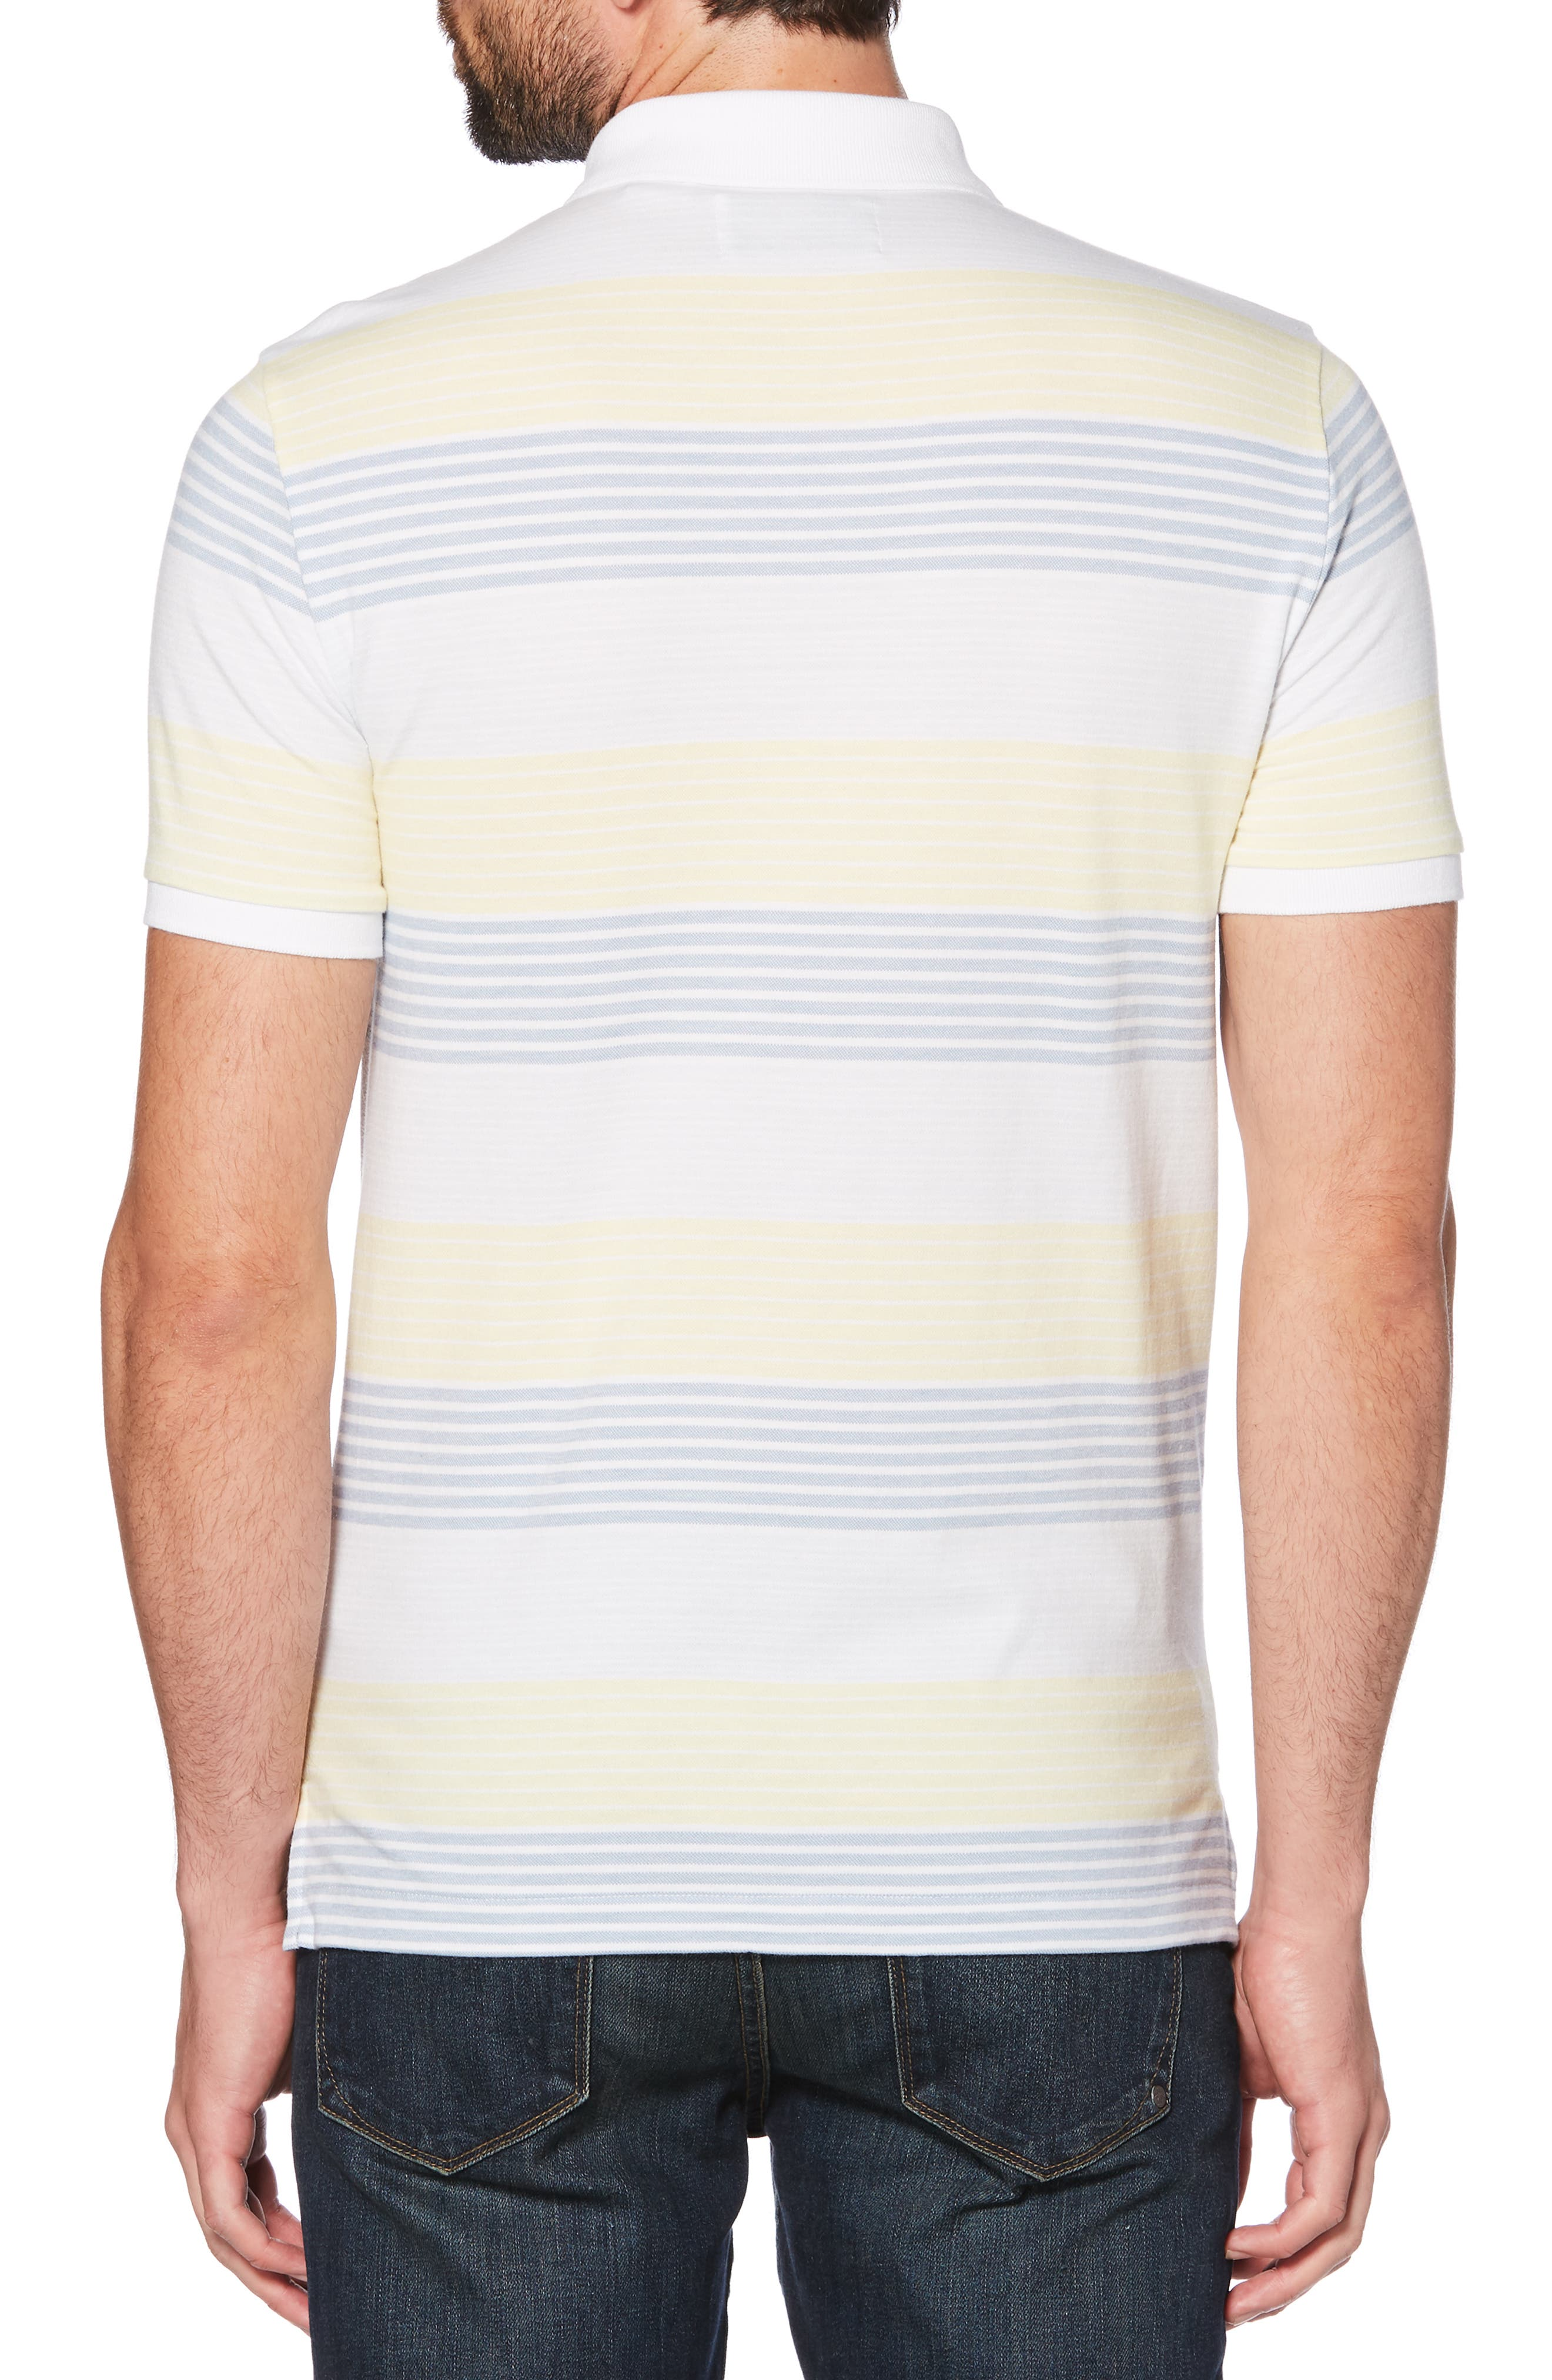 ORIGINAL PENGUIN, Engineered Stripe Polo, Alternate thumbnail 2, color, BRIGHT WHITE